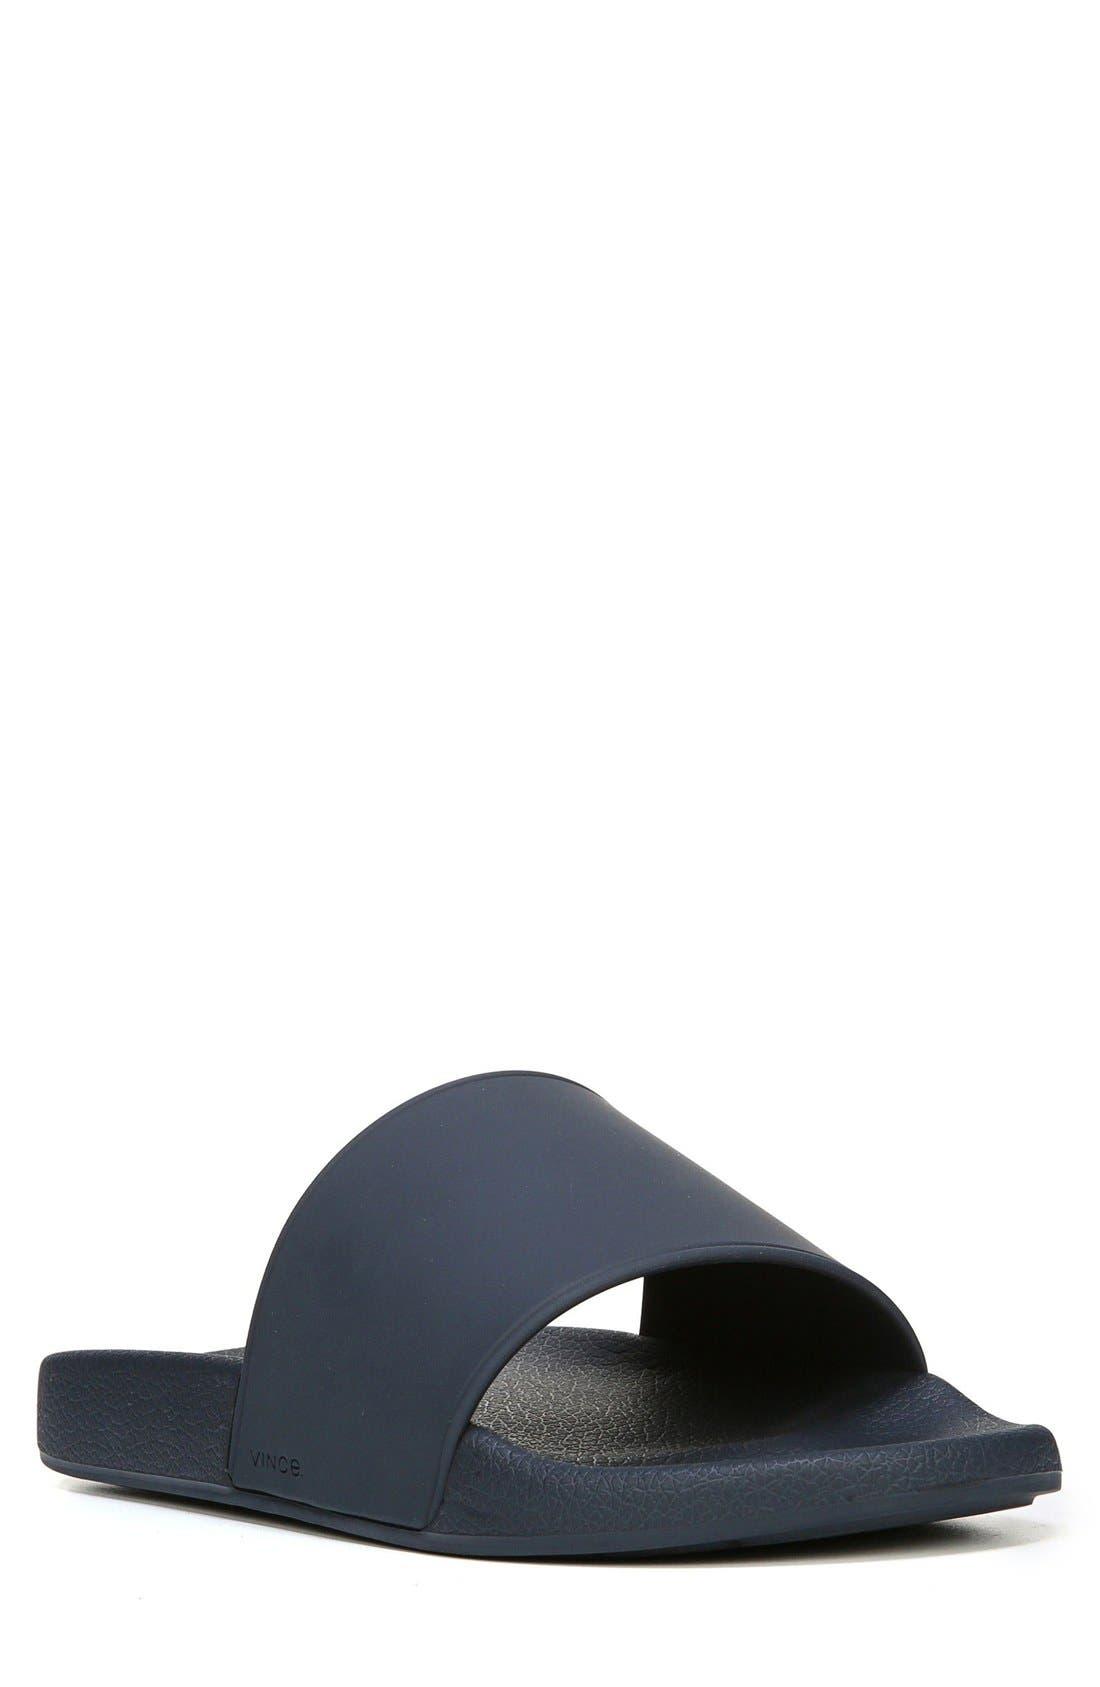 Westcoast Sport Sandal,                             Main thumbnail 1, color,                             Coastal Blue